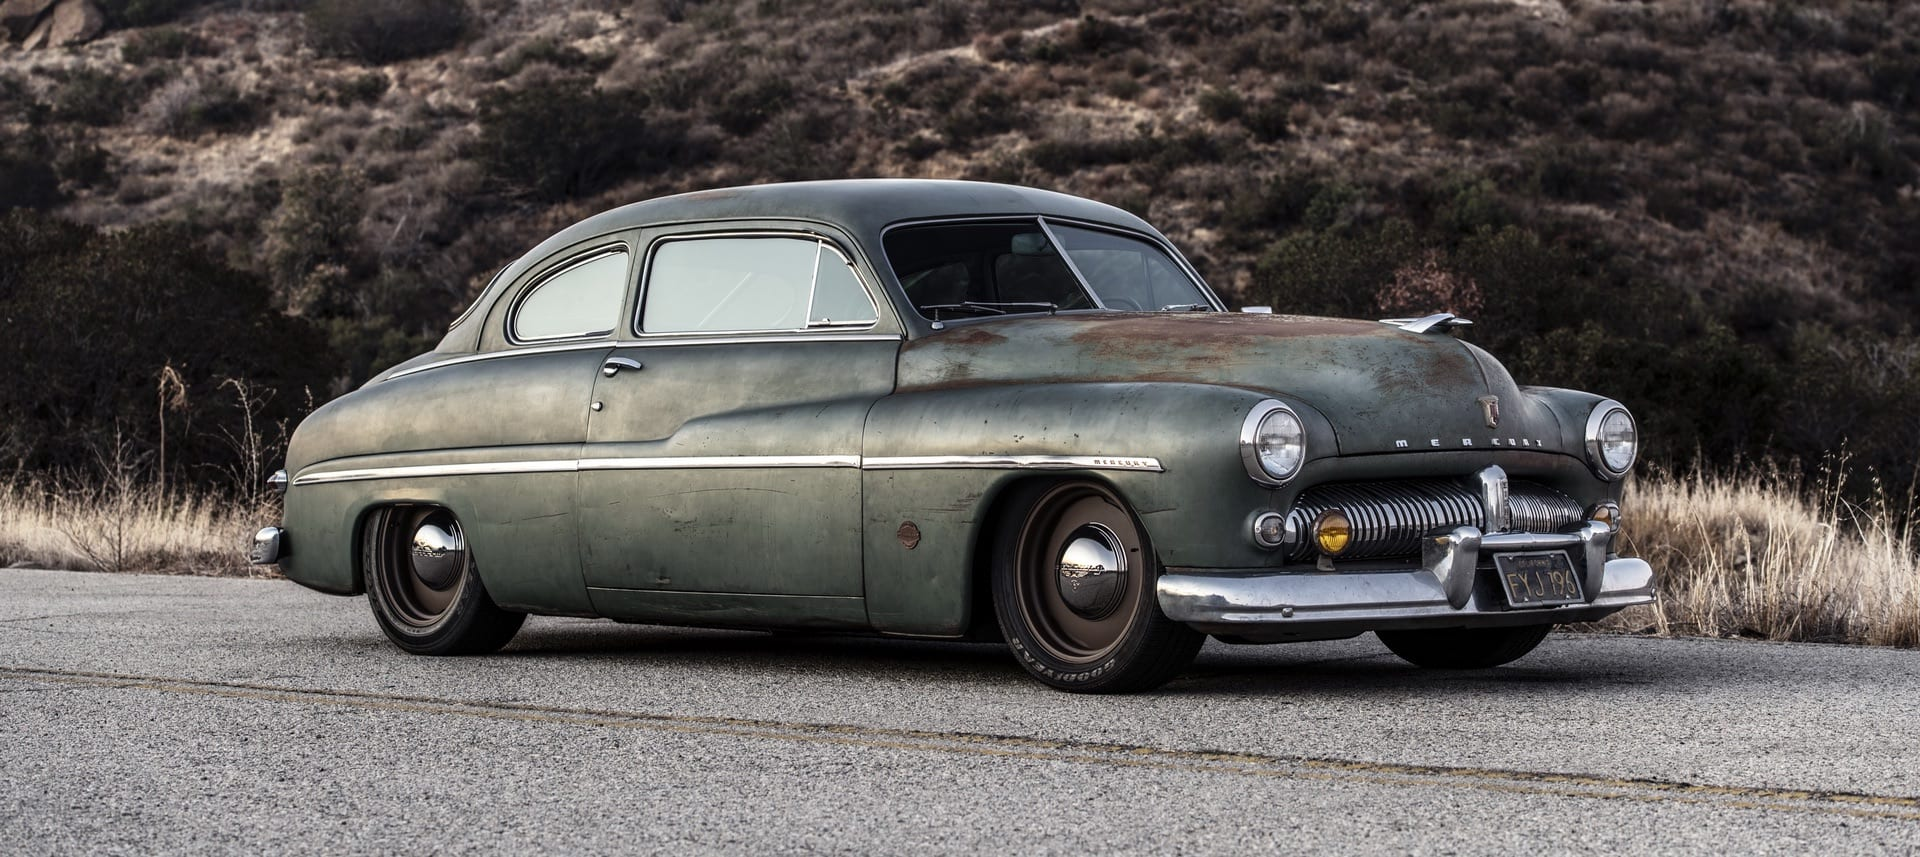 Icon's 1949 Mercury Coupe EV